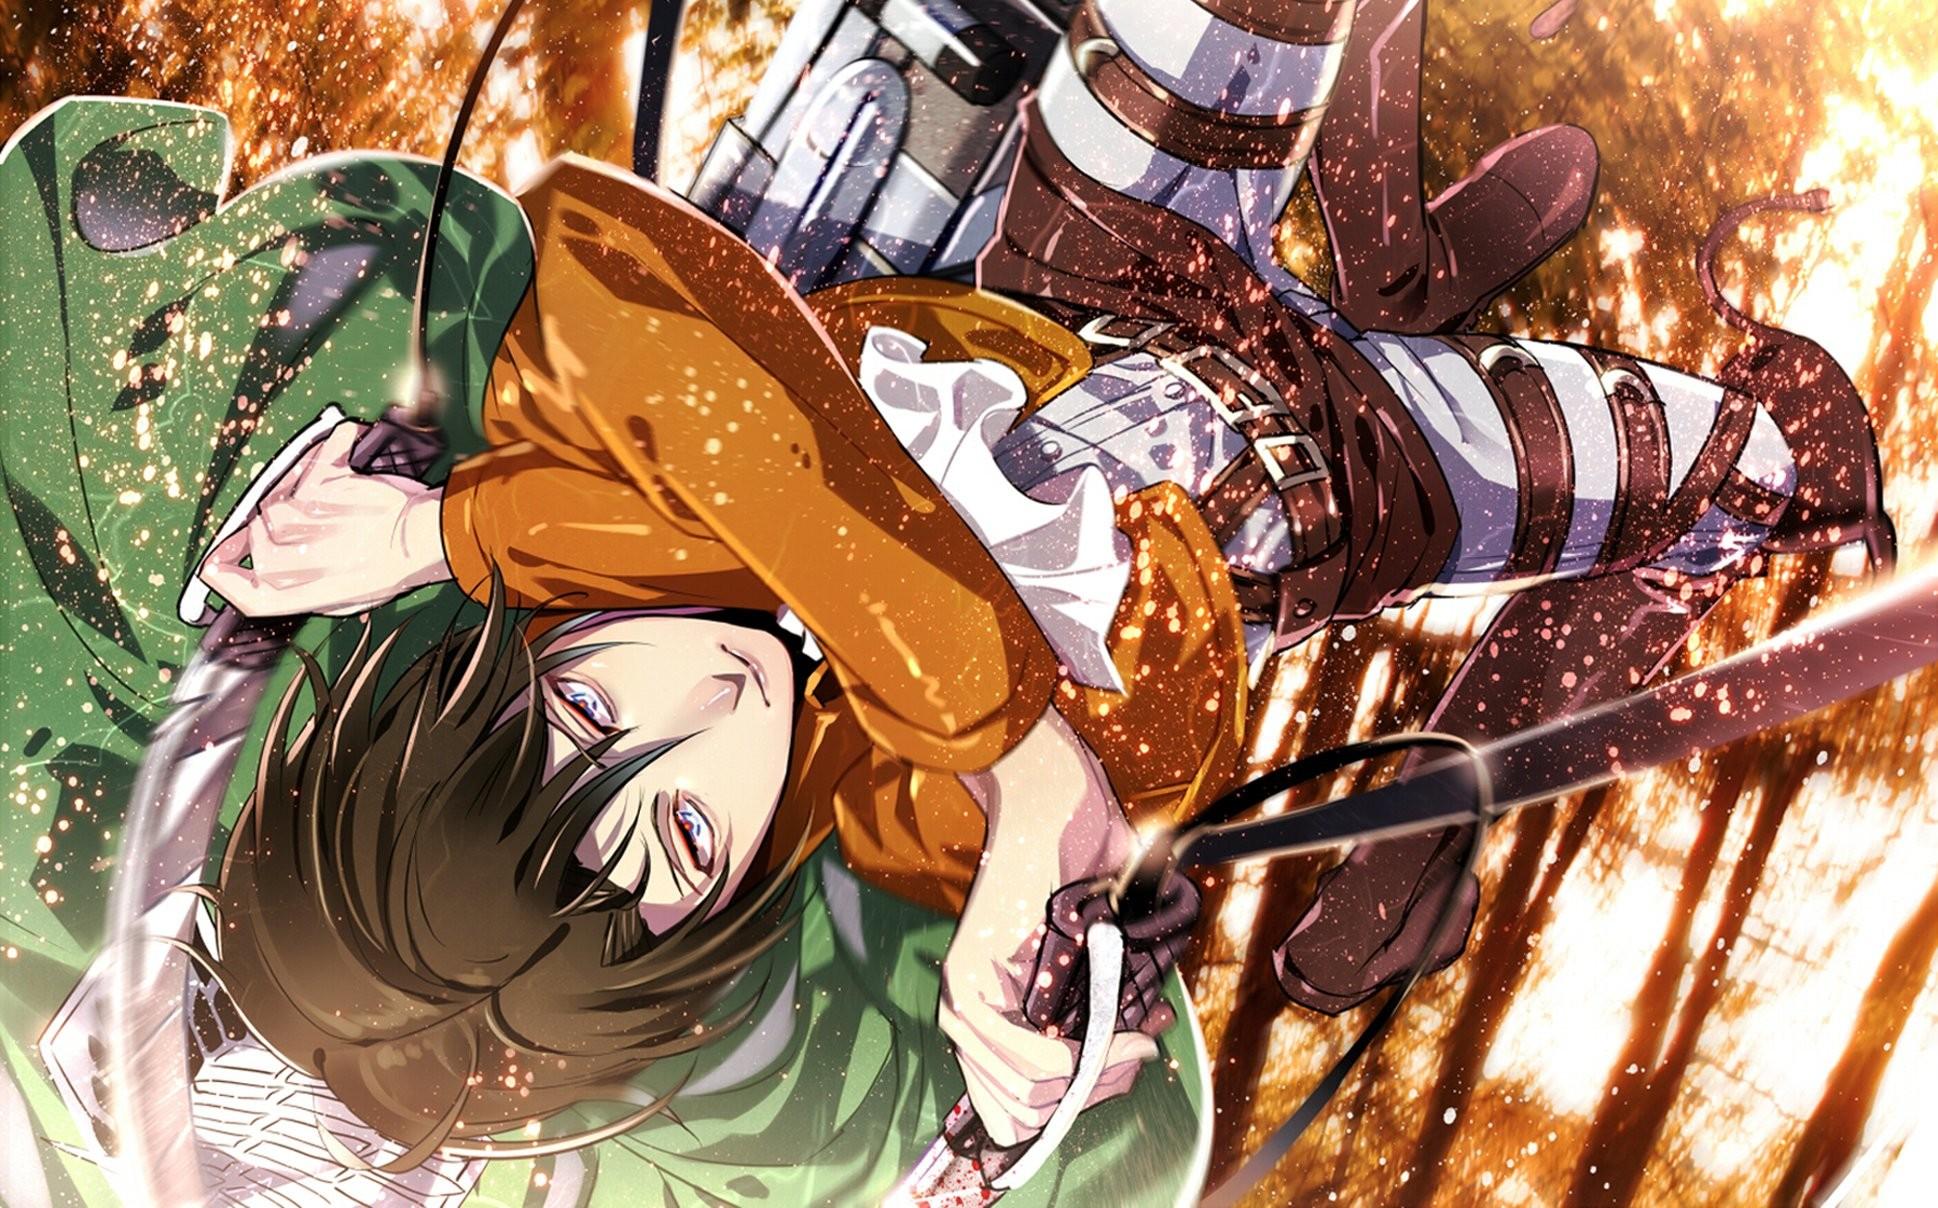 Attack on titan shingeki no kyojin guy anime art rivaille levi wallpaper      932959   WallpaperUP